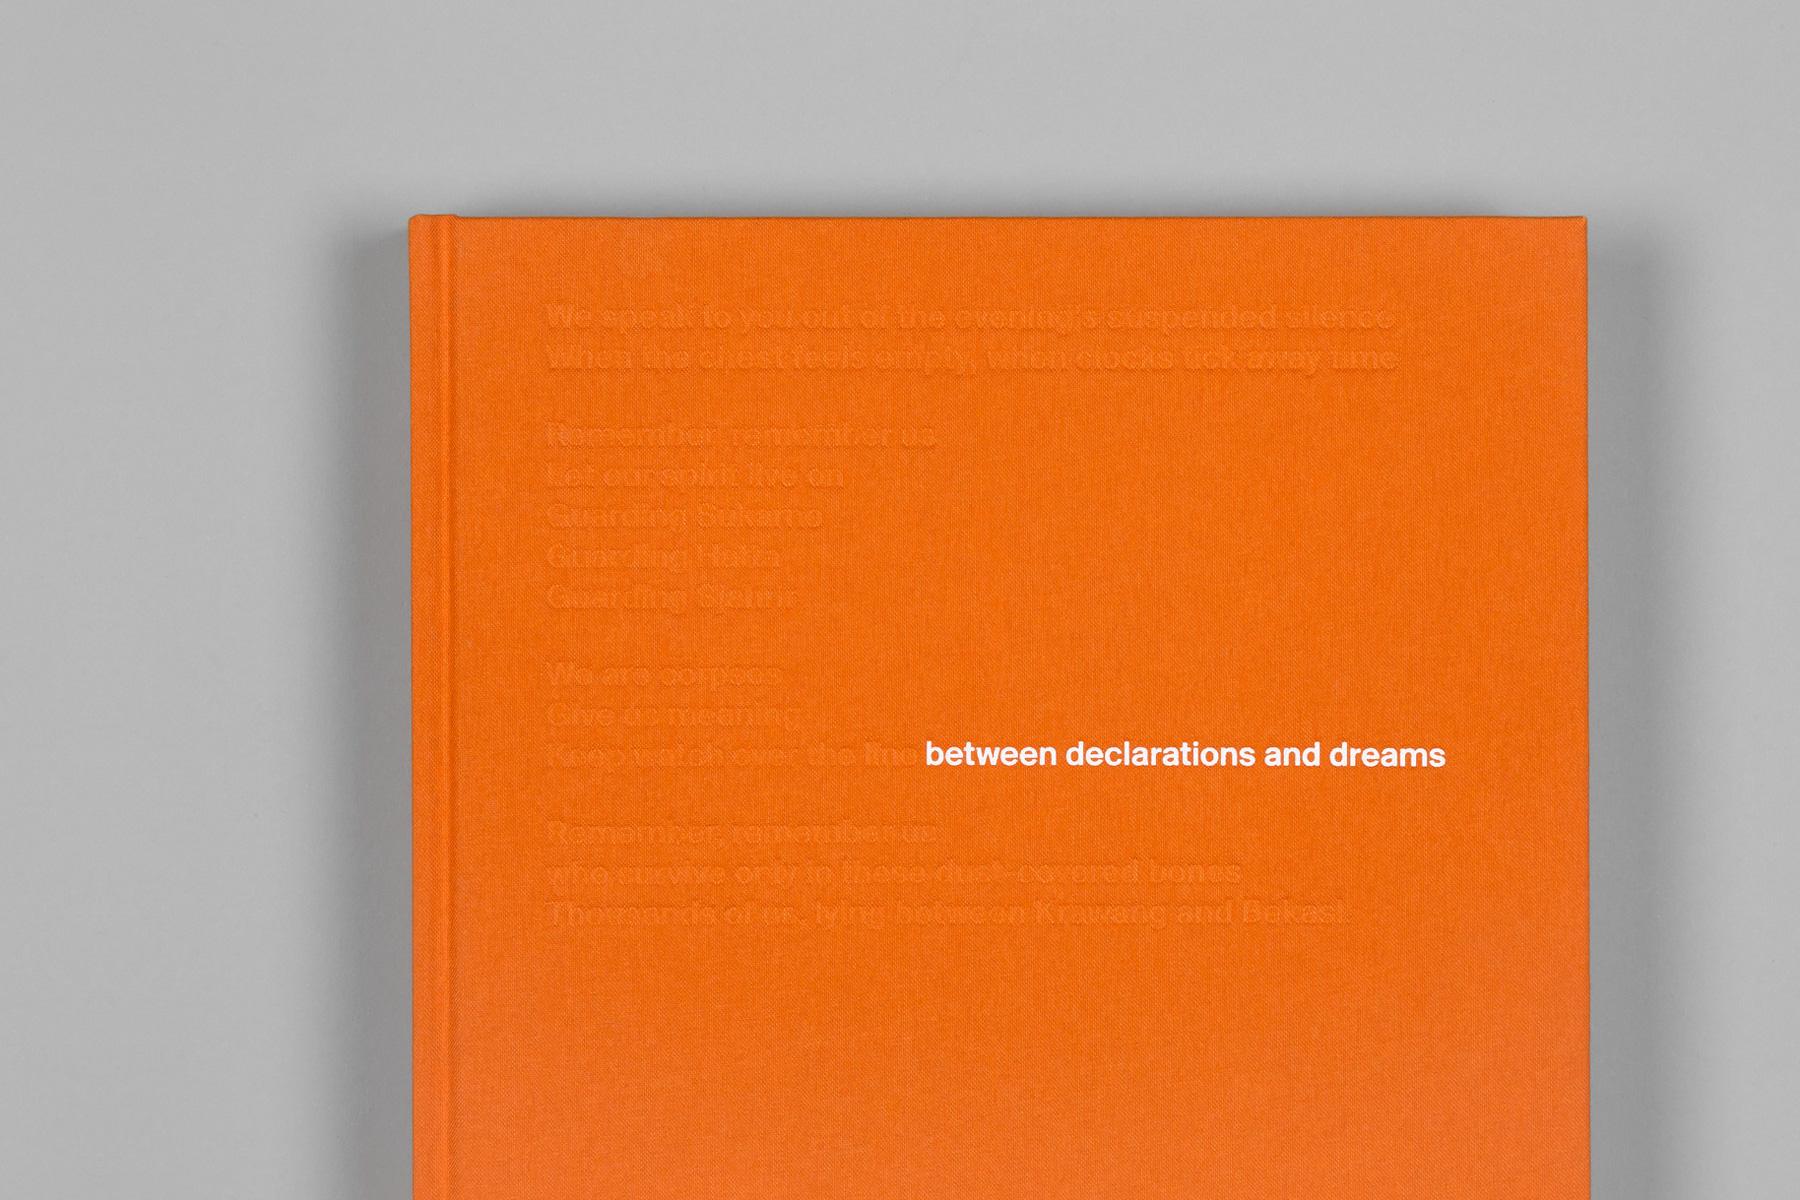 NGS-Between-Declaring-and-Dreams-2